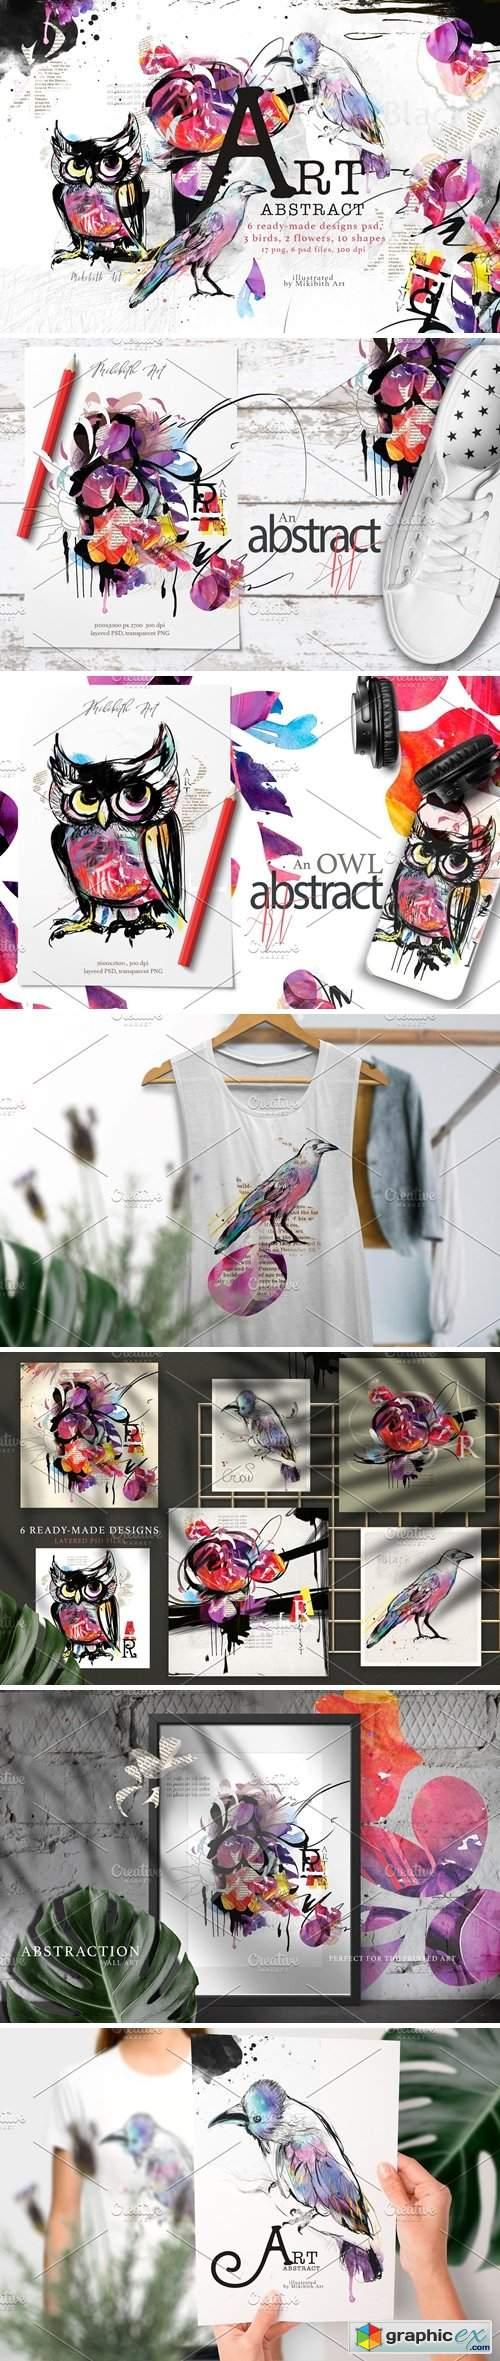 Abstract Art 3475811